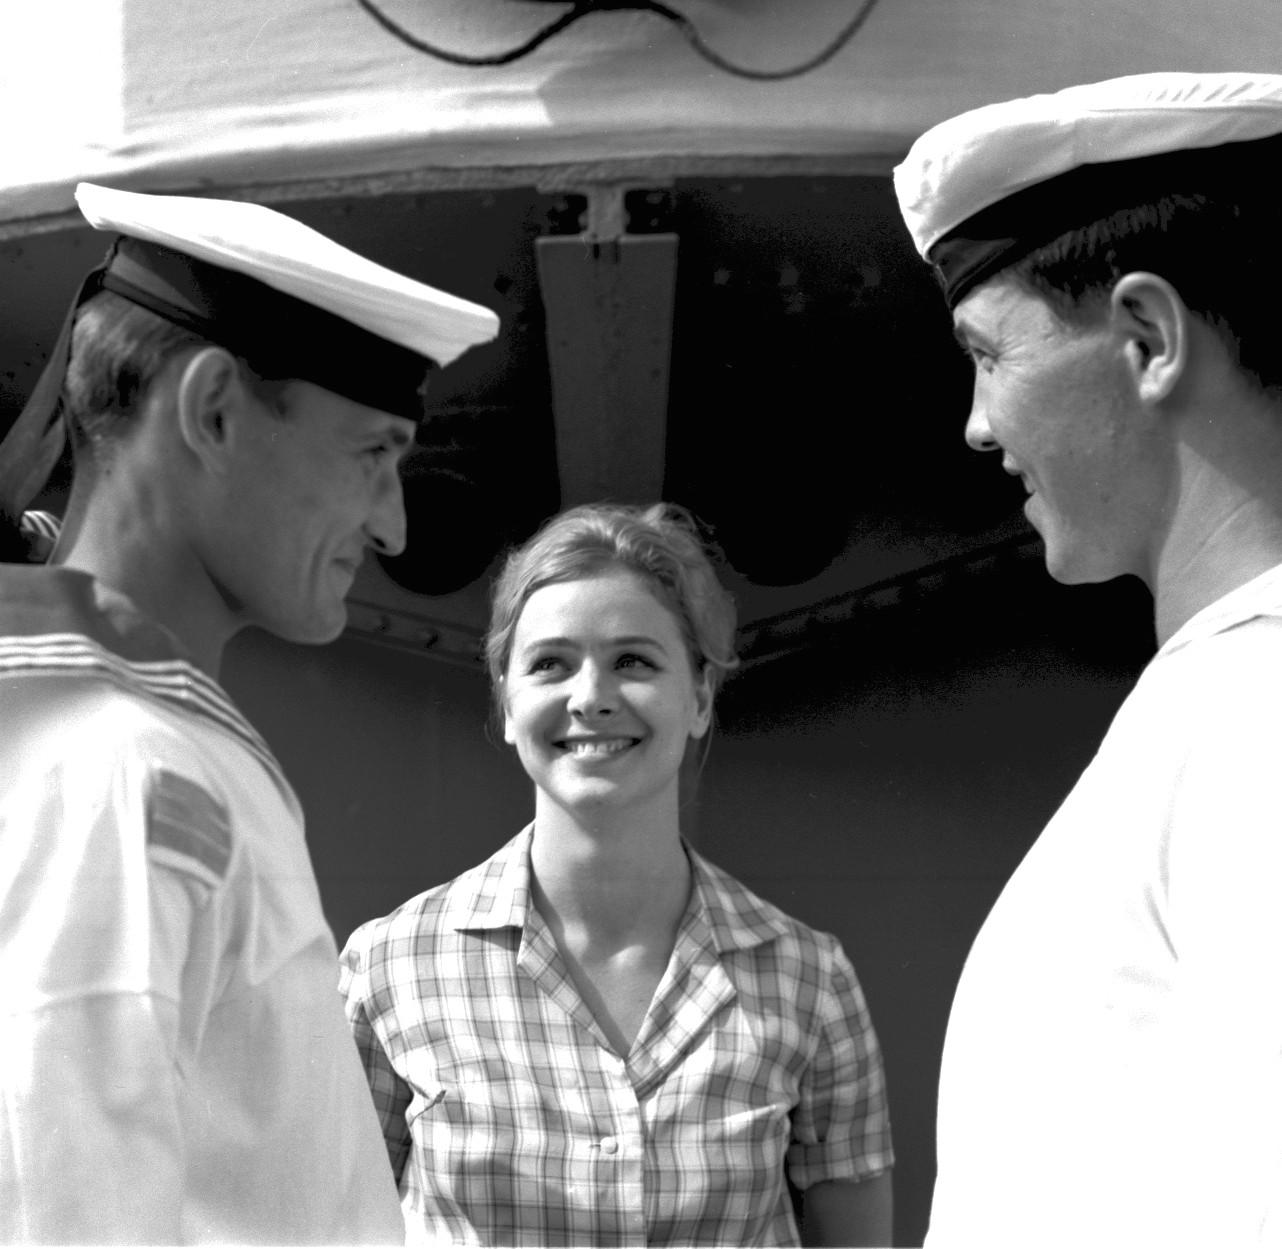 Моряки и женщина на крейсере Аврора, 1965,06